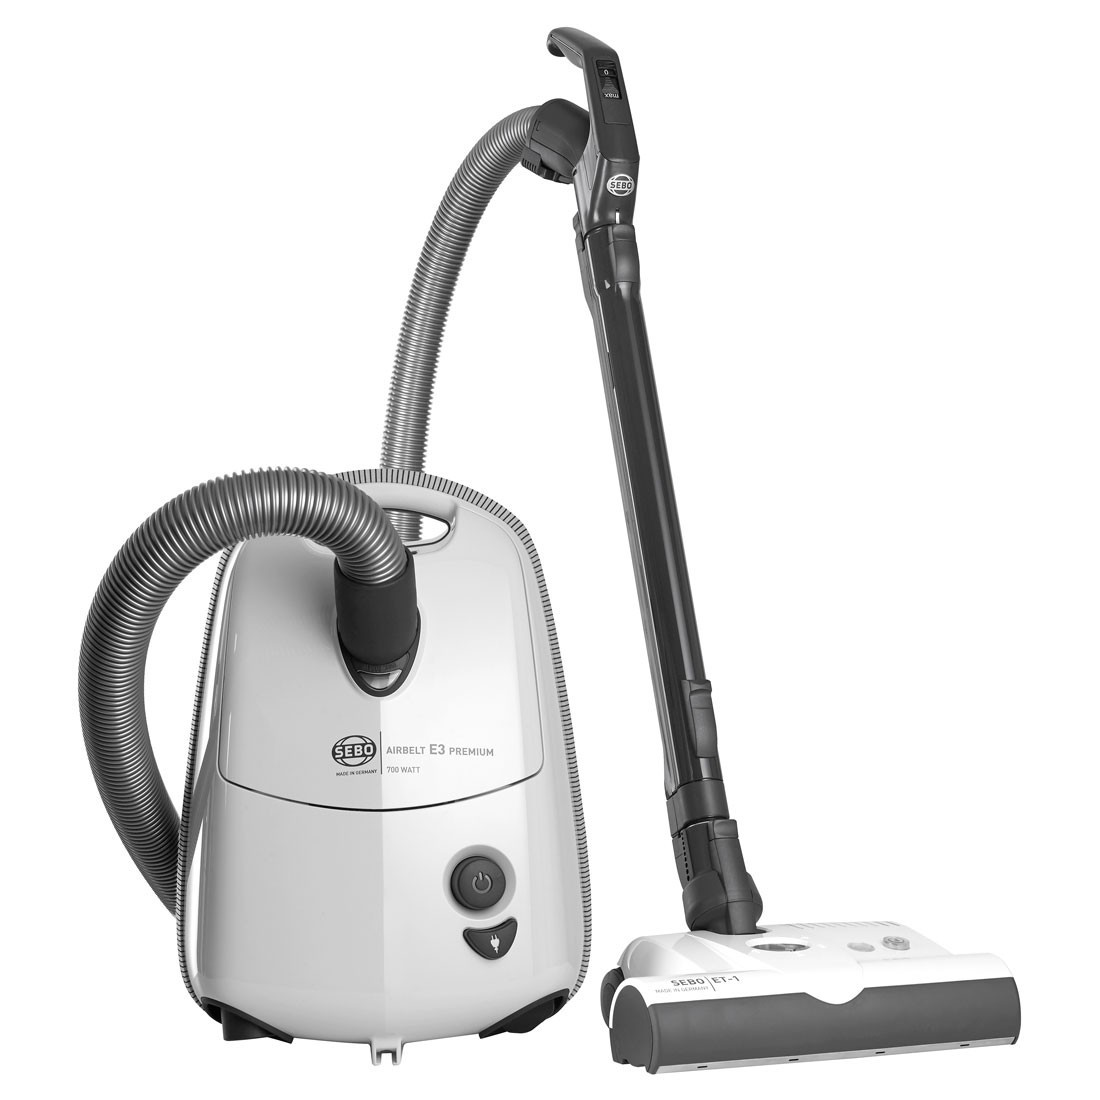 Sebo Airbelt E3 Premium ePower Vacuum Cleaner